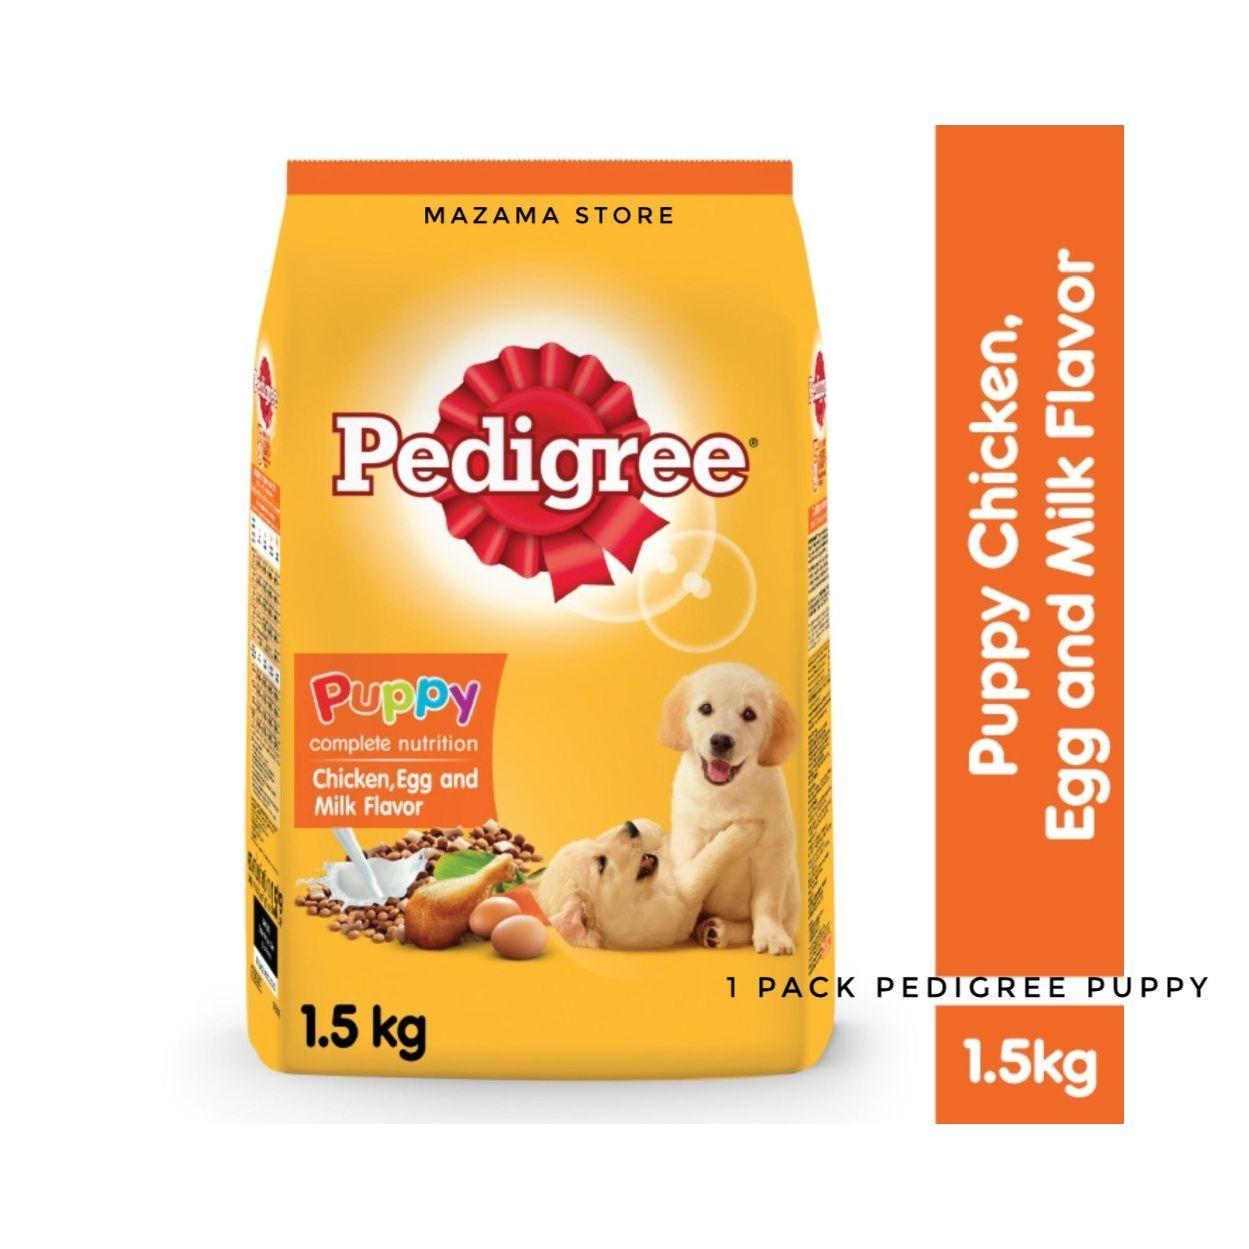 1 Pack Pedigree Dog Food Puppy Chicken, Egg And Milk Flavor Net 1,5 Kg / Dog Food / Pedigree Dog Food / Makanan Untuk Anak Anjing / Makanan Kering Untuk Anjing Puppy / Puppy Dog Food